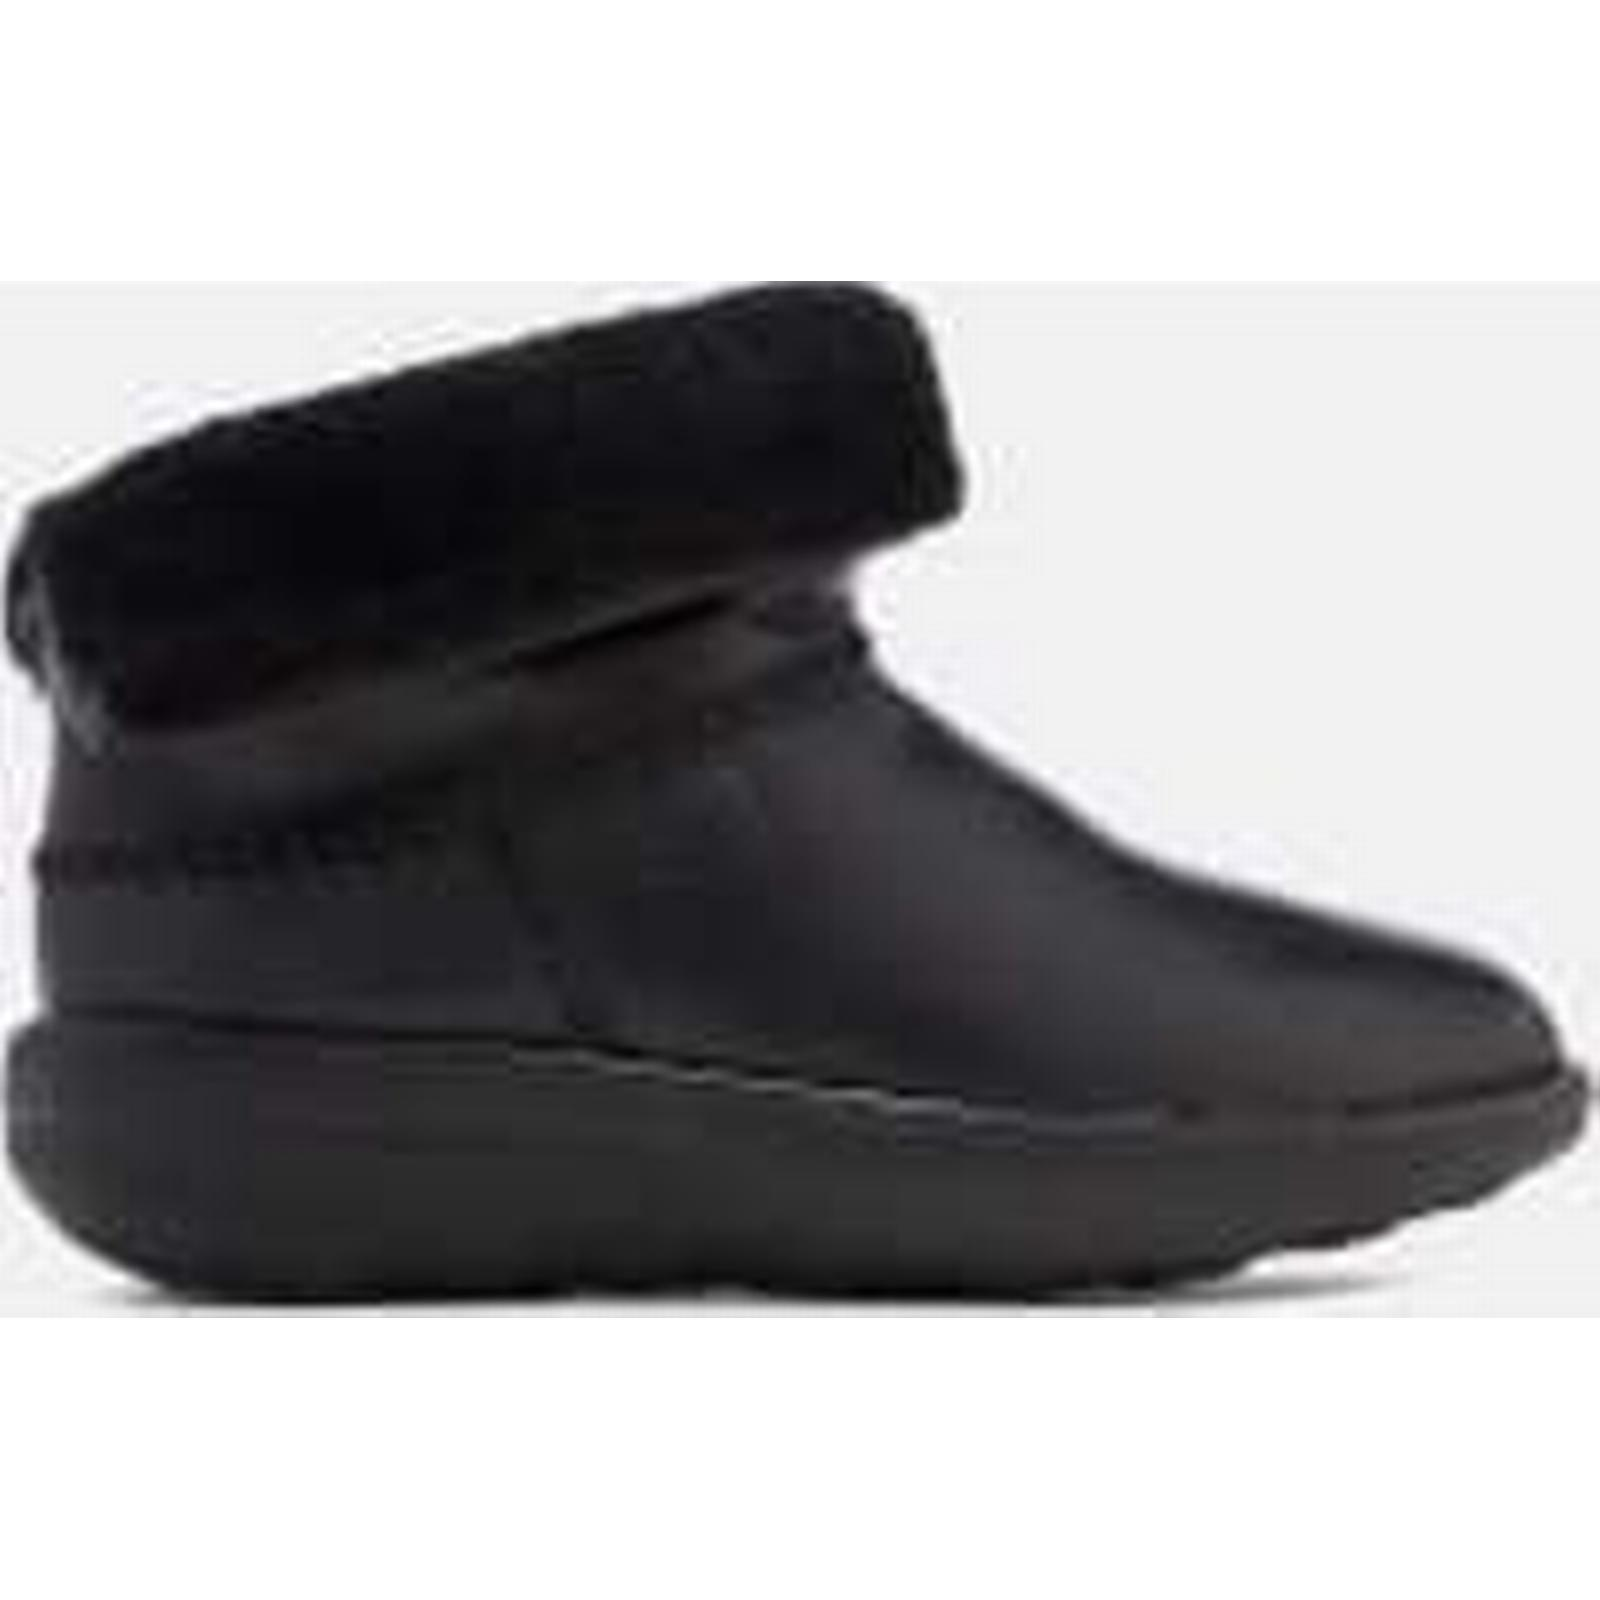 fitflop fitflop fitflop femmes & #  ; s mukluk cuir shorty  bottes - noir b400d9